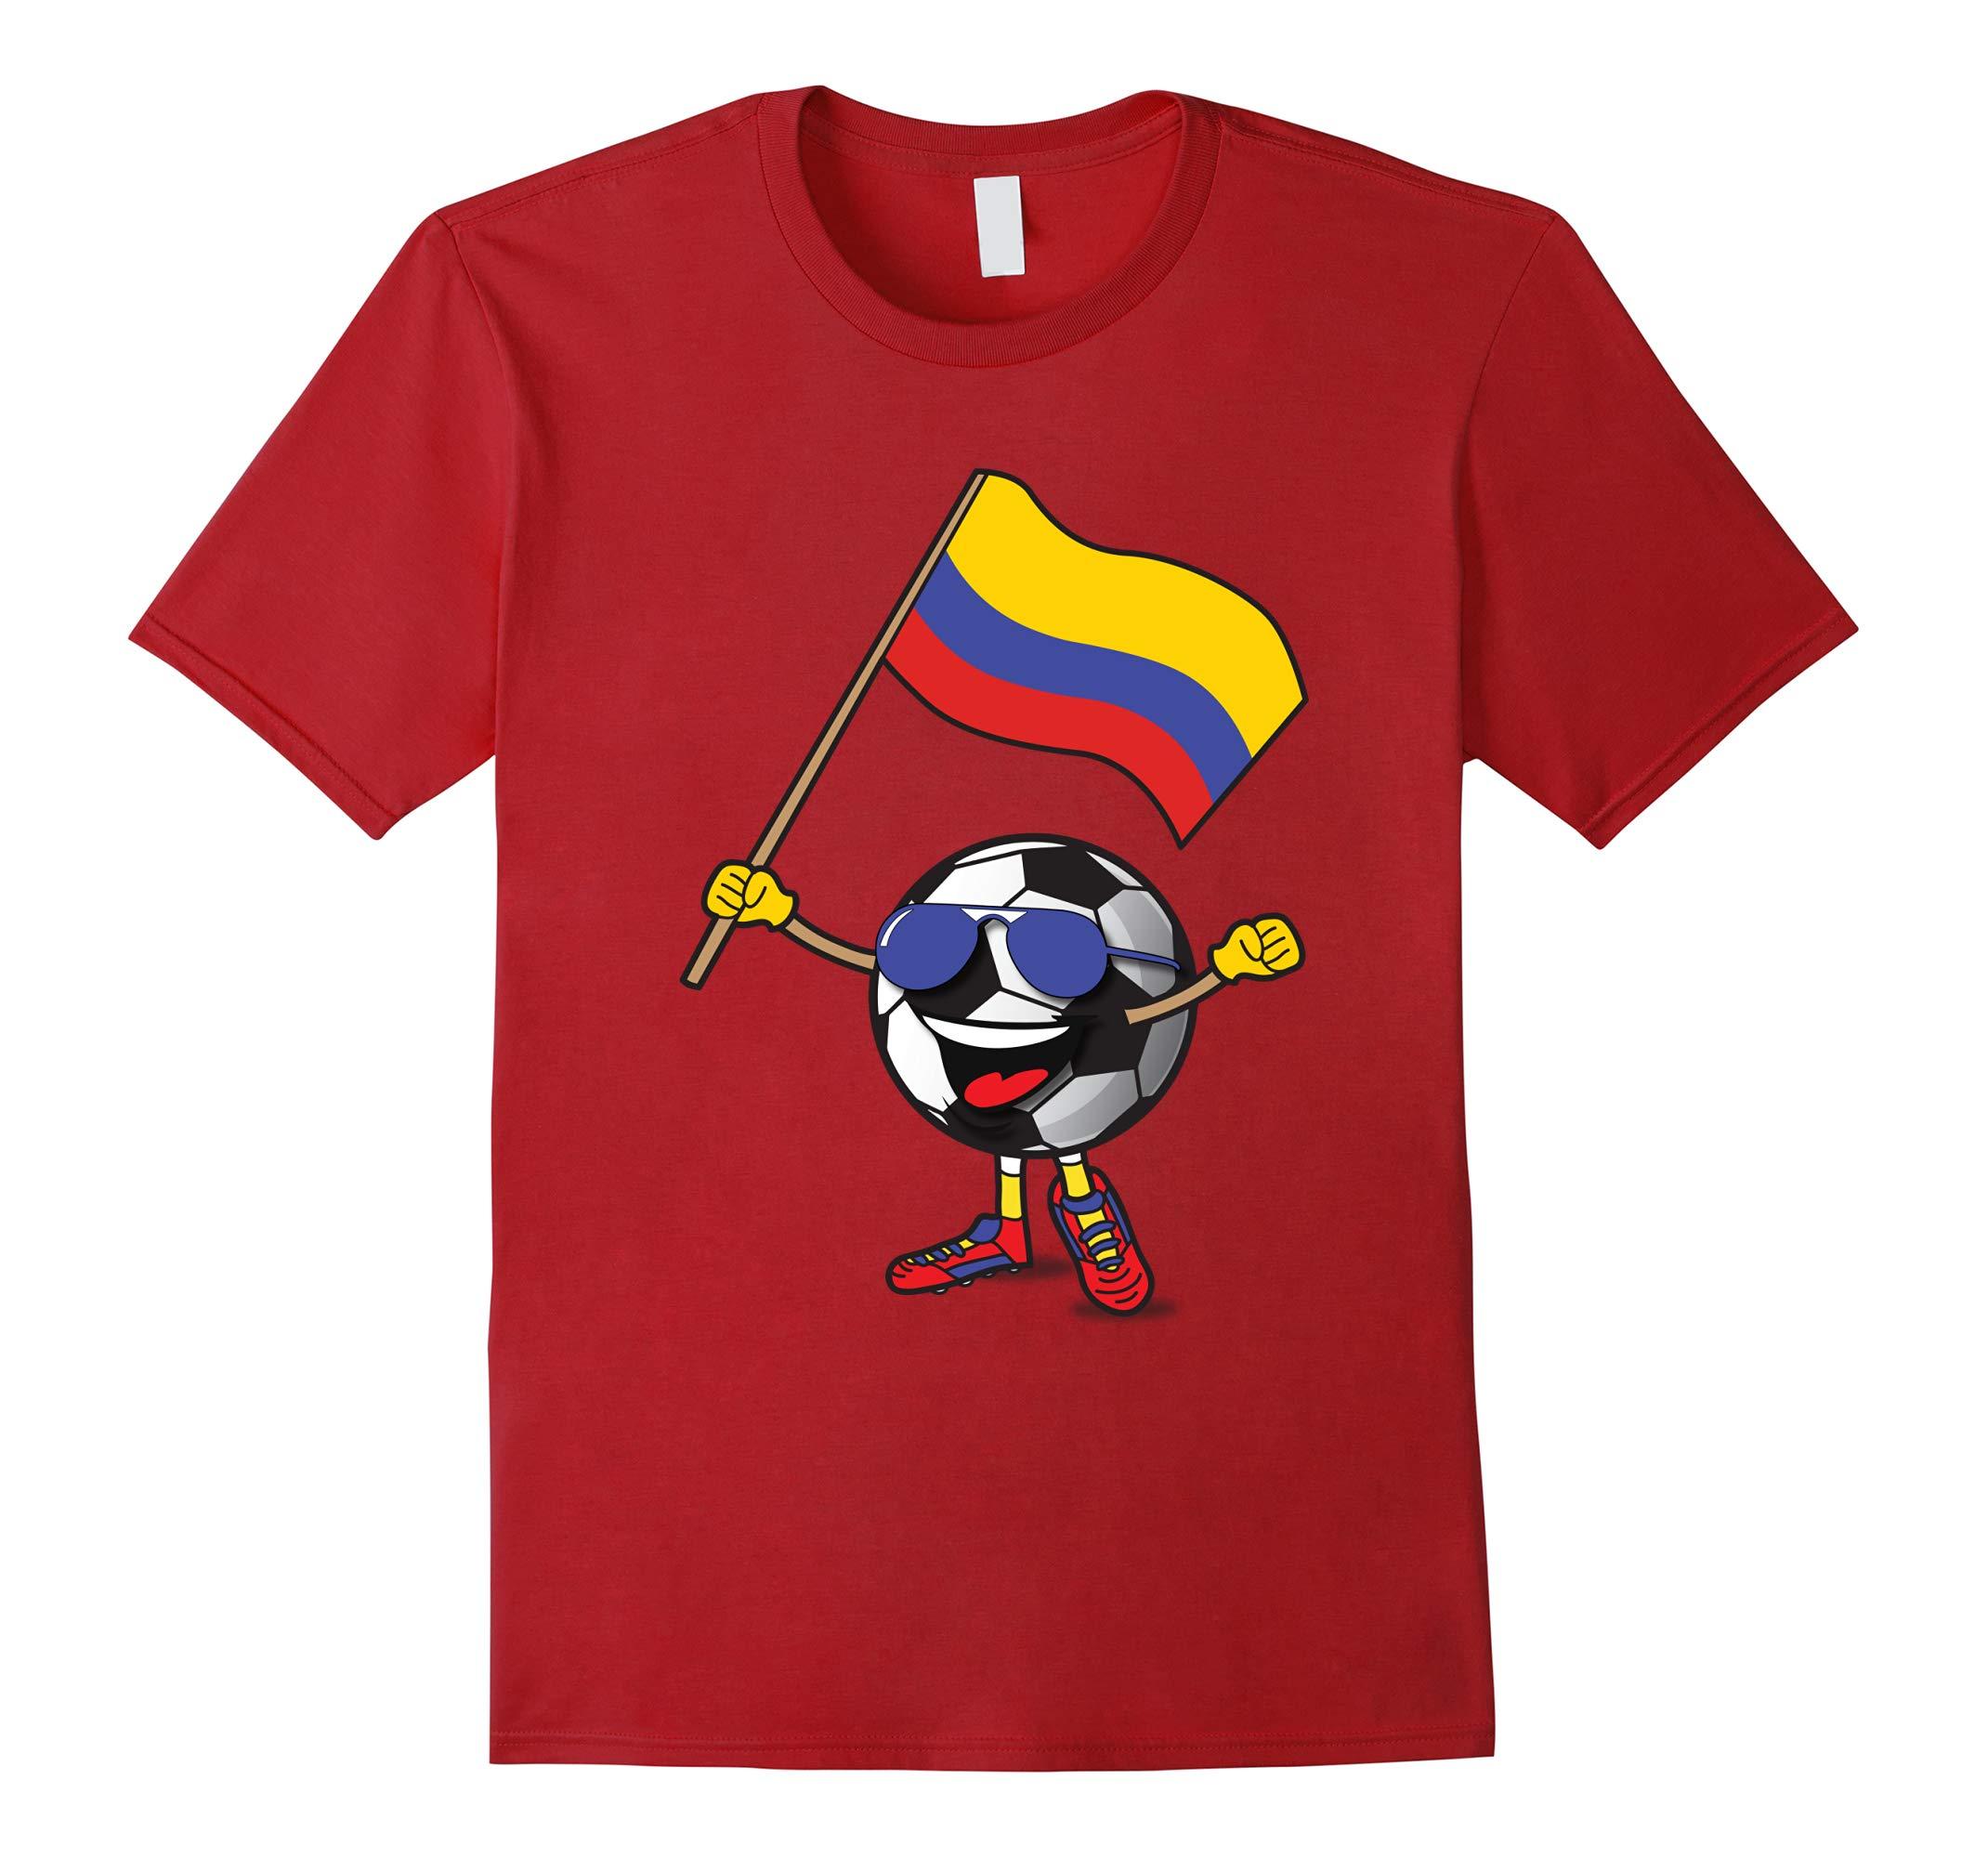 Colombia National Team Soccer Ball Fan Shirt For Boys Girls-RT